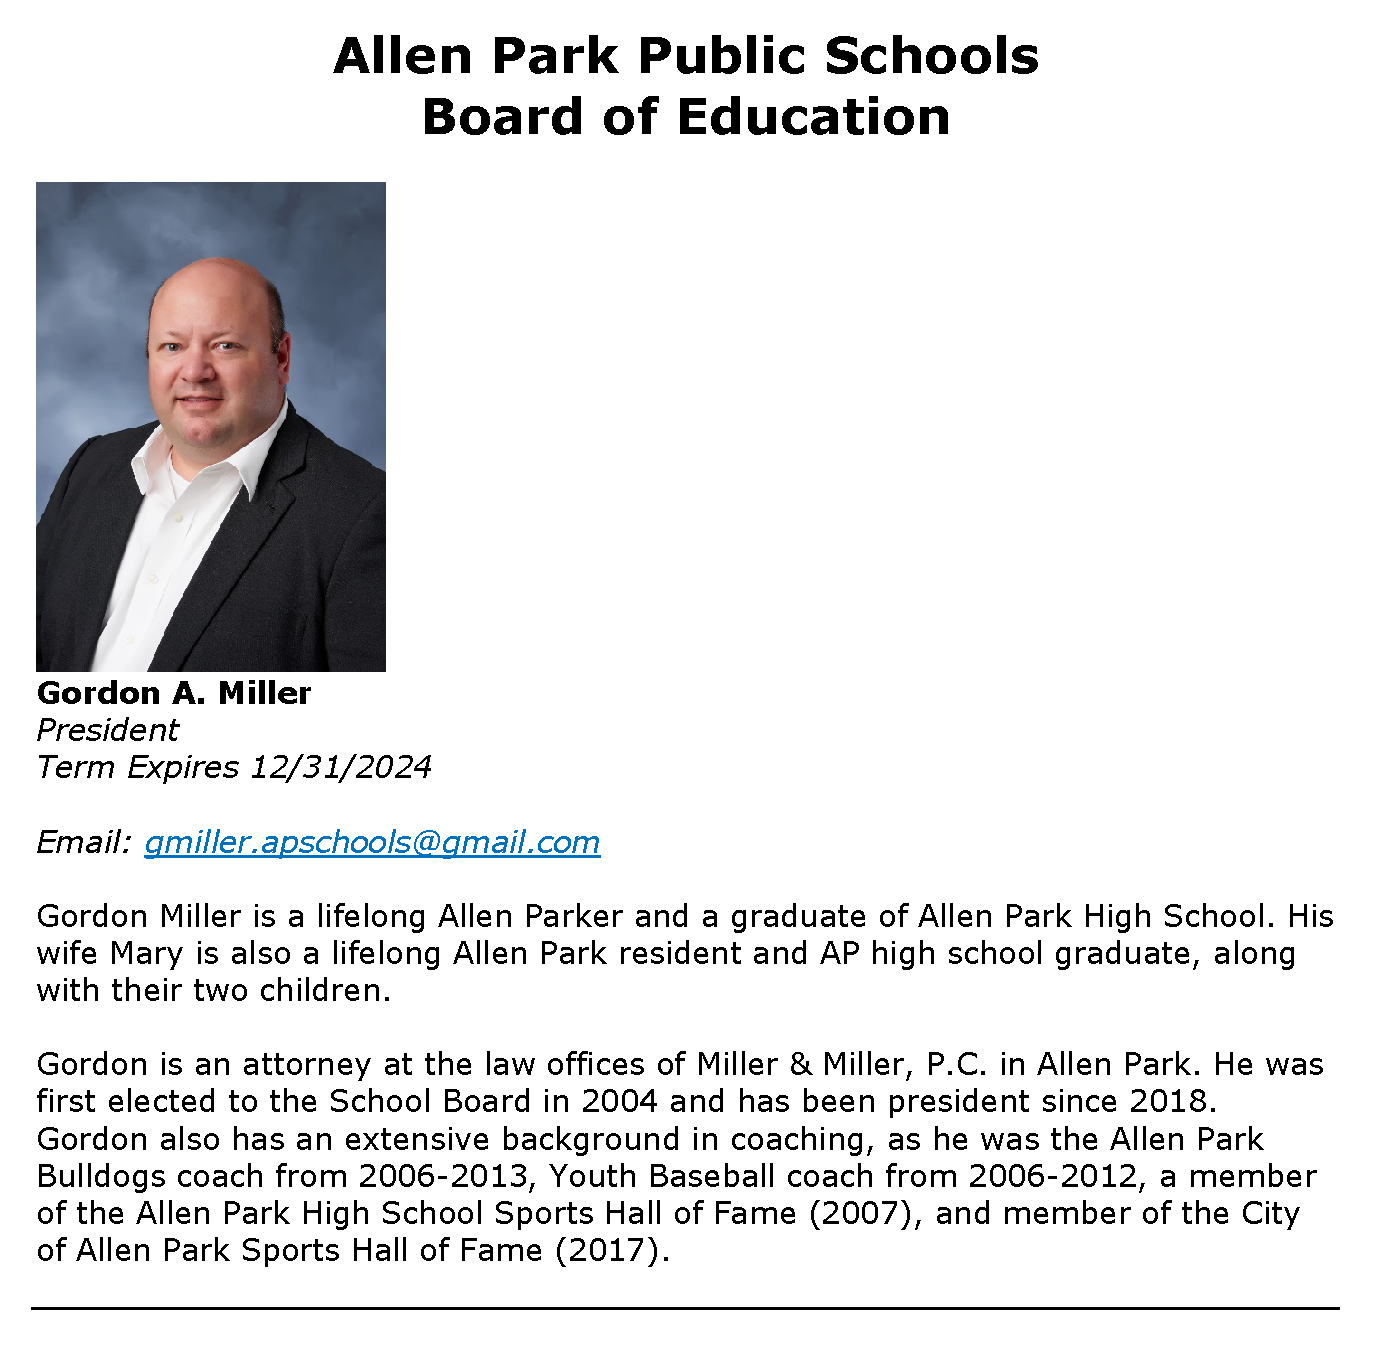 Board of Education Members - Miller